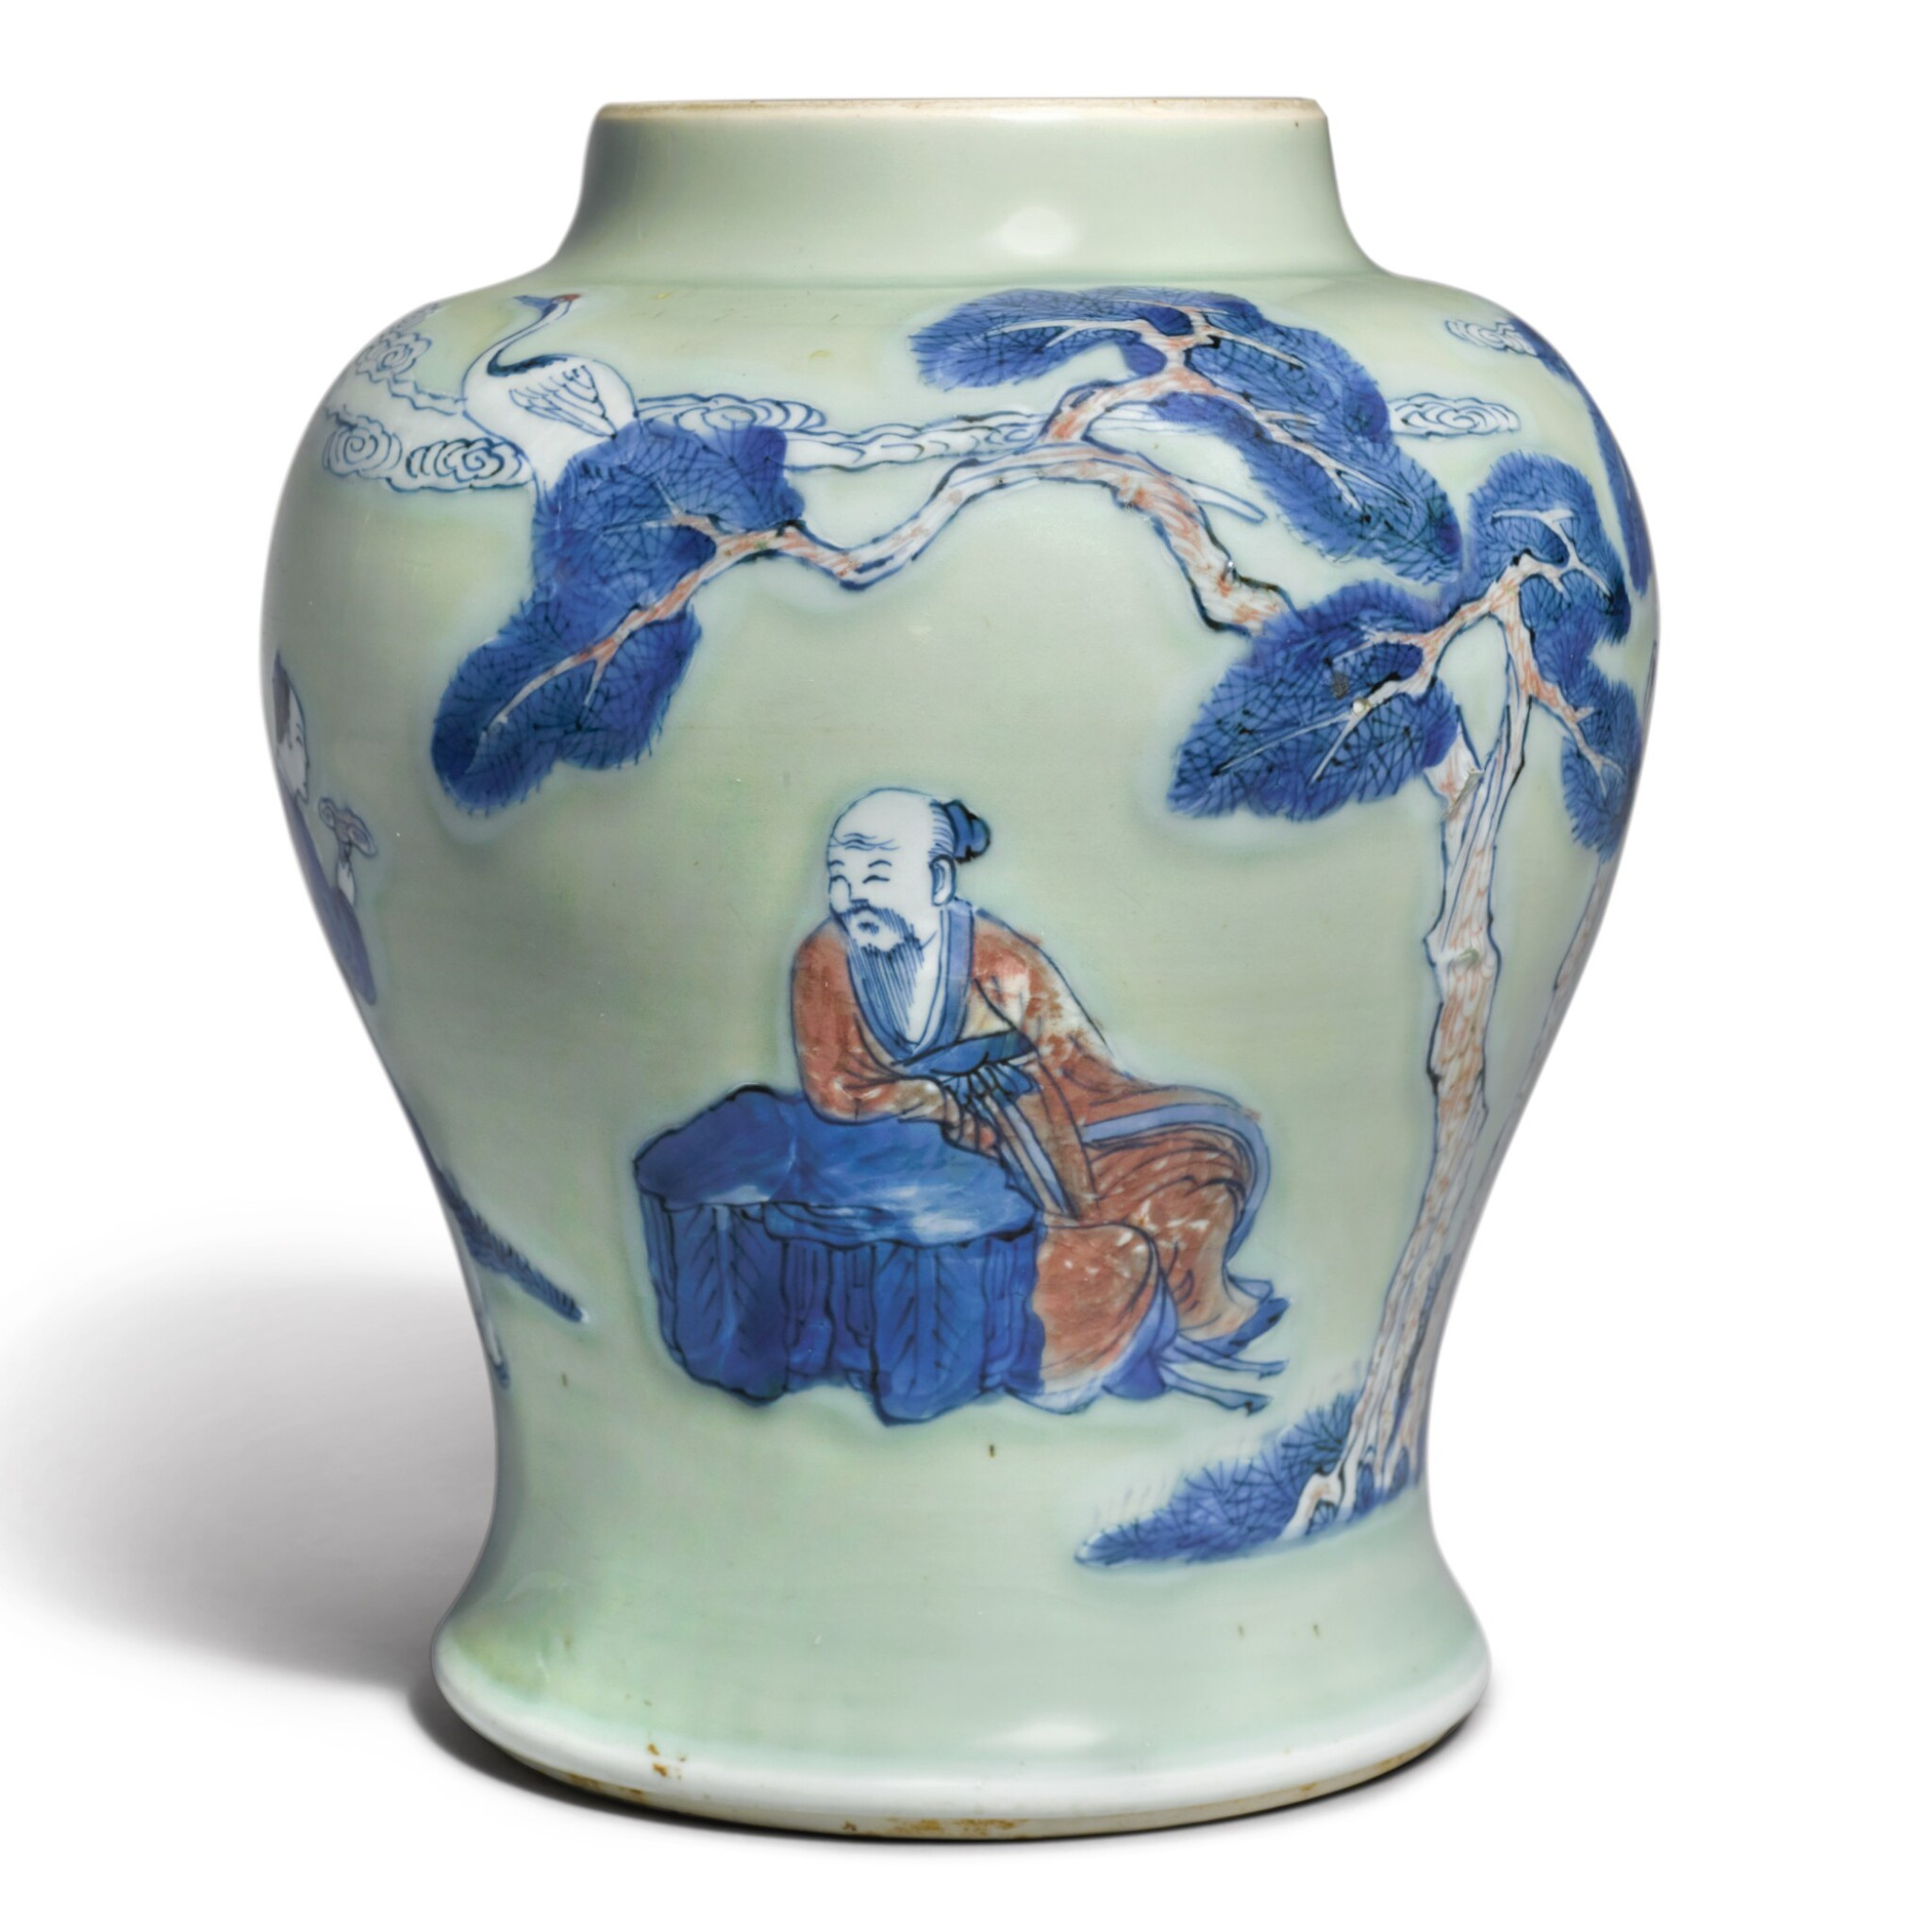 View full screen - View 1 of Lot 143. An underglaze-blue, copper-red, and celadon-glazed jar, Qing dynasty, Kangxi period   清康熙 豆青地青花釉裏紅松下高士圖罐.